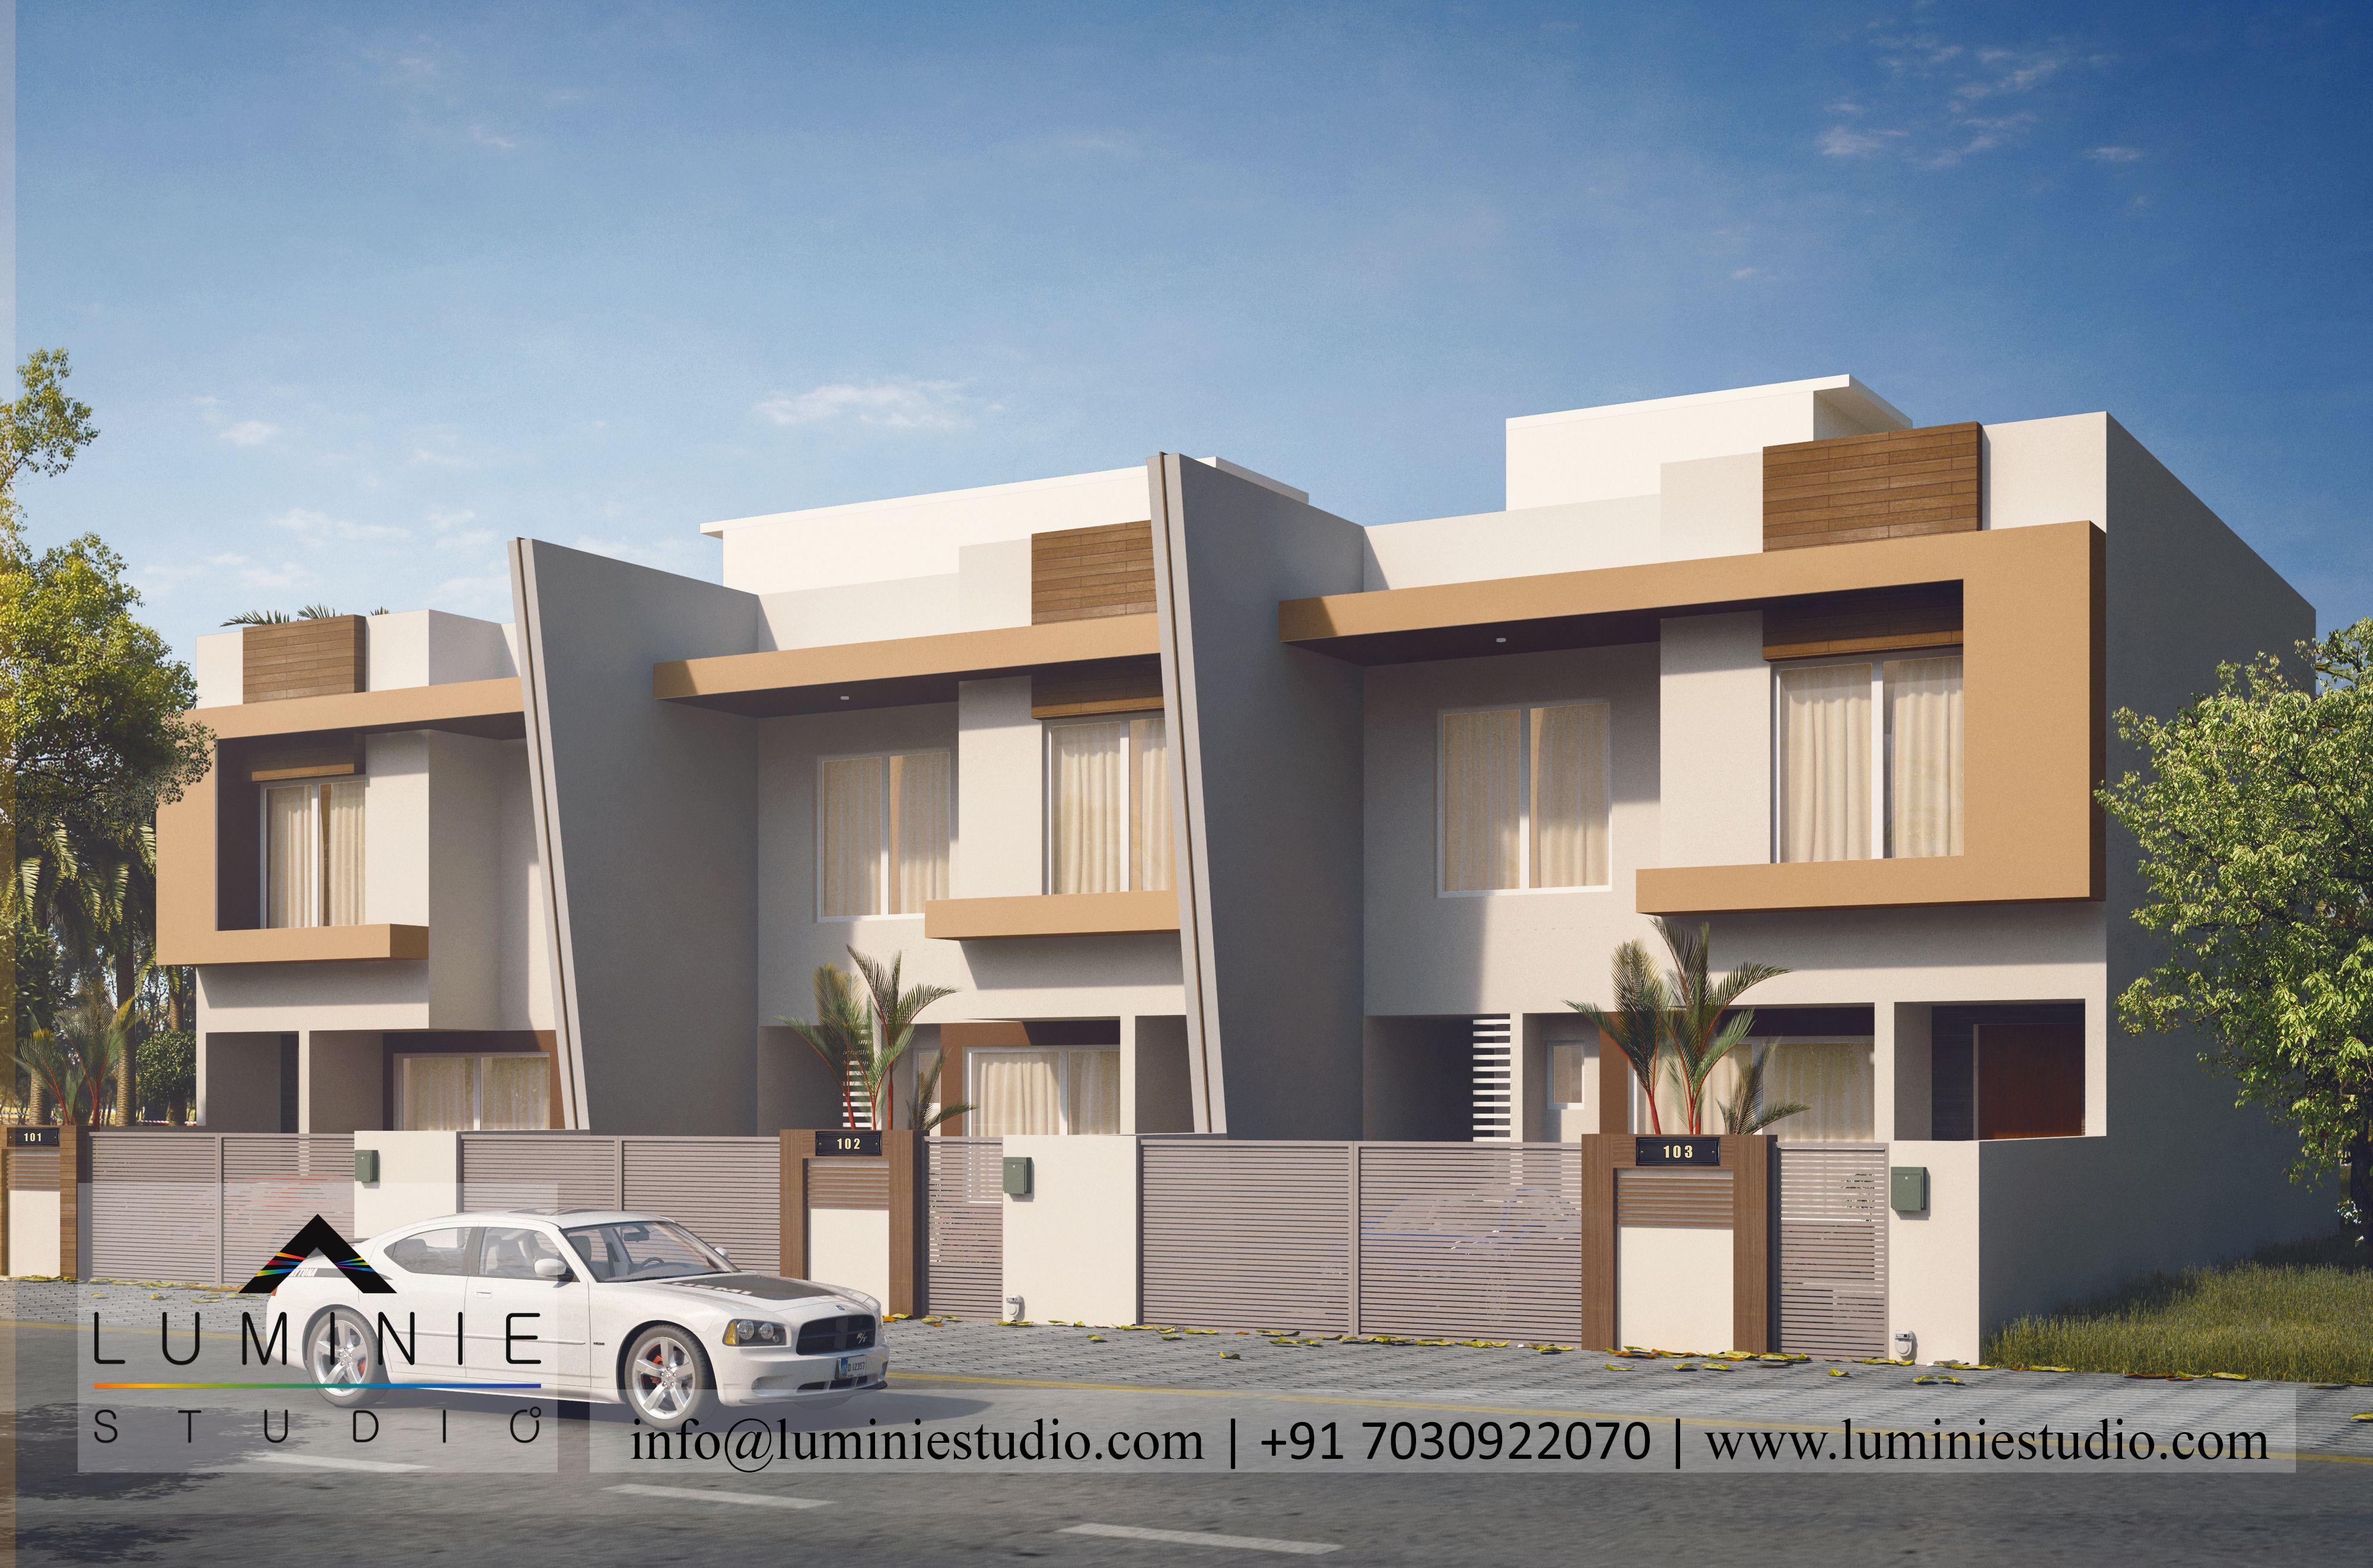 #moderndesign #exteriordesign #exteriordecor #exteriorideas #3d  #architectural #architect #architecturaldesign